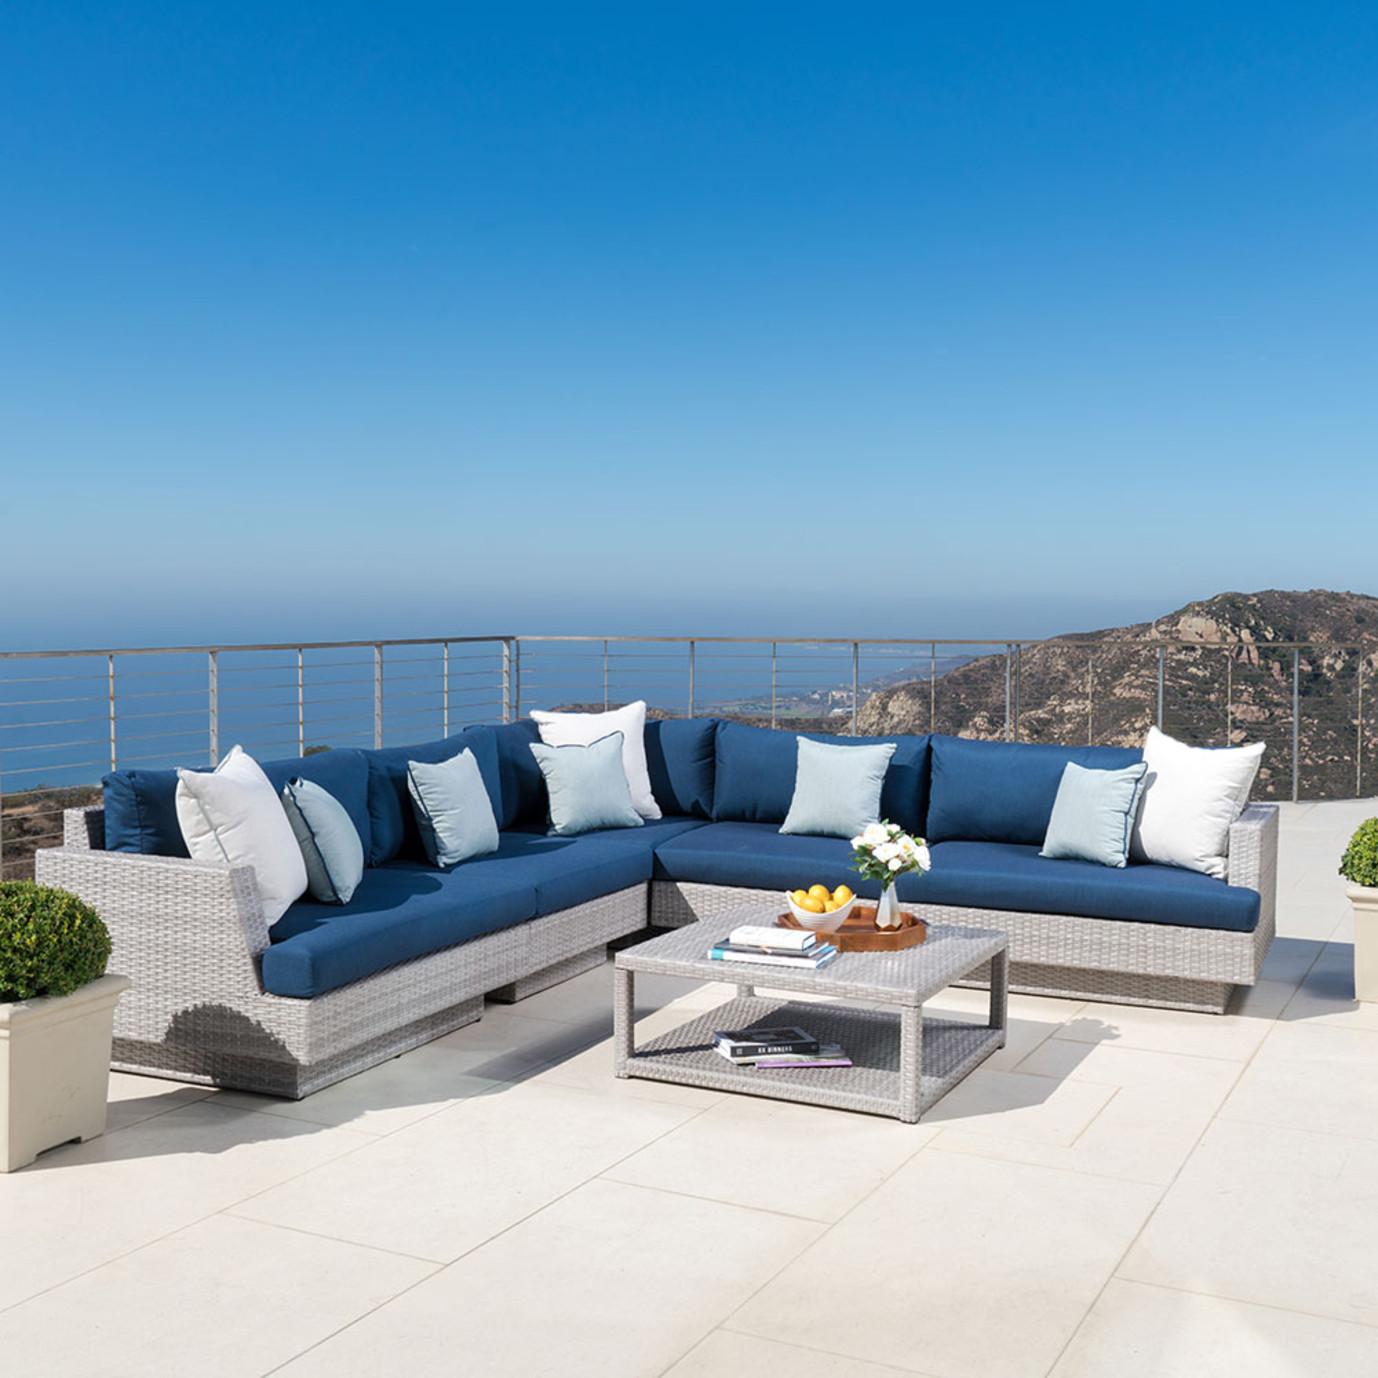 Portofino Comfort 6pc Sofa Sectional Laguna Blue Rst